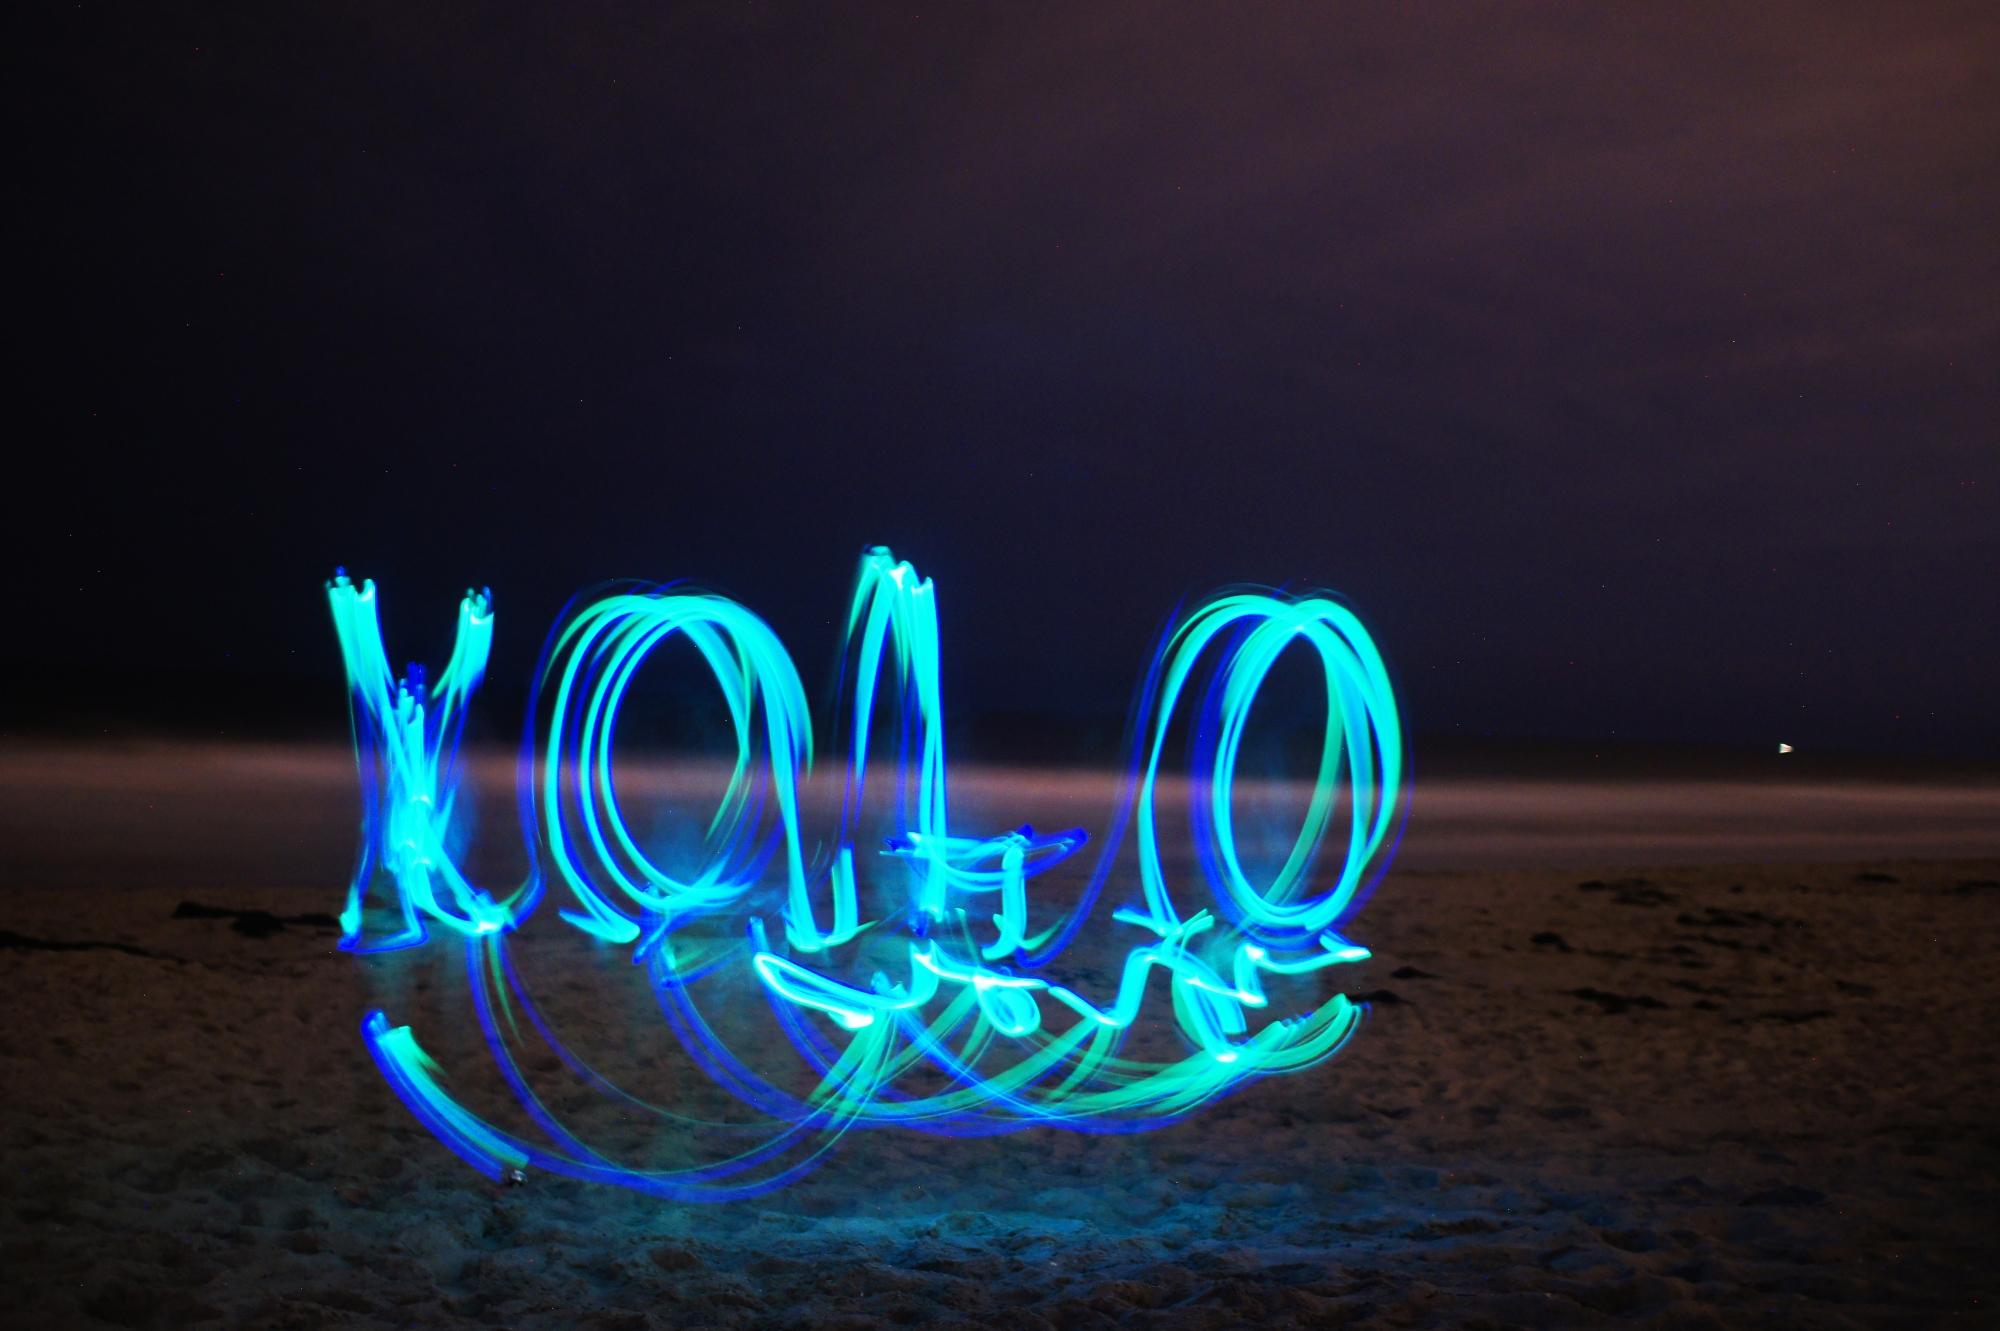 yolo Light drawing